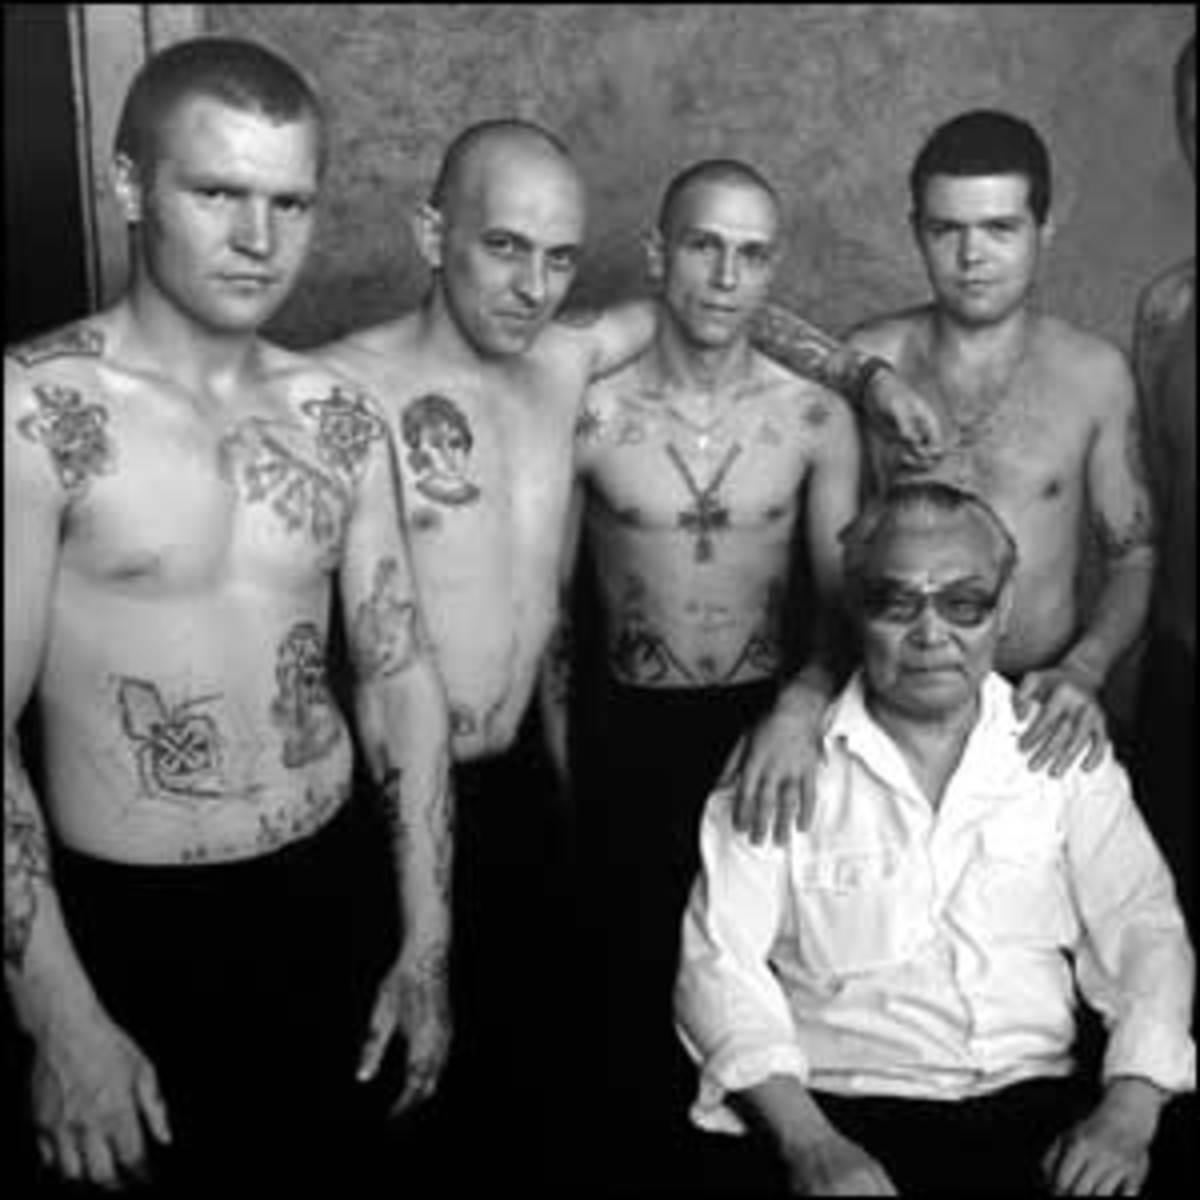 Danzig Baldaev (seated), author of the Russian Criminal Tattoo Encyclopedia